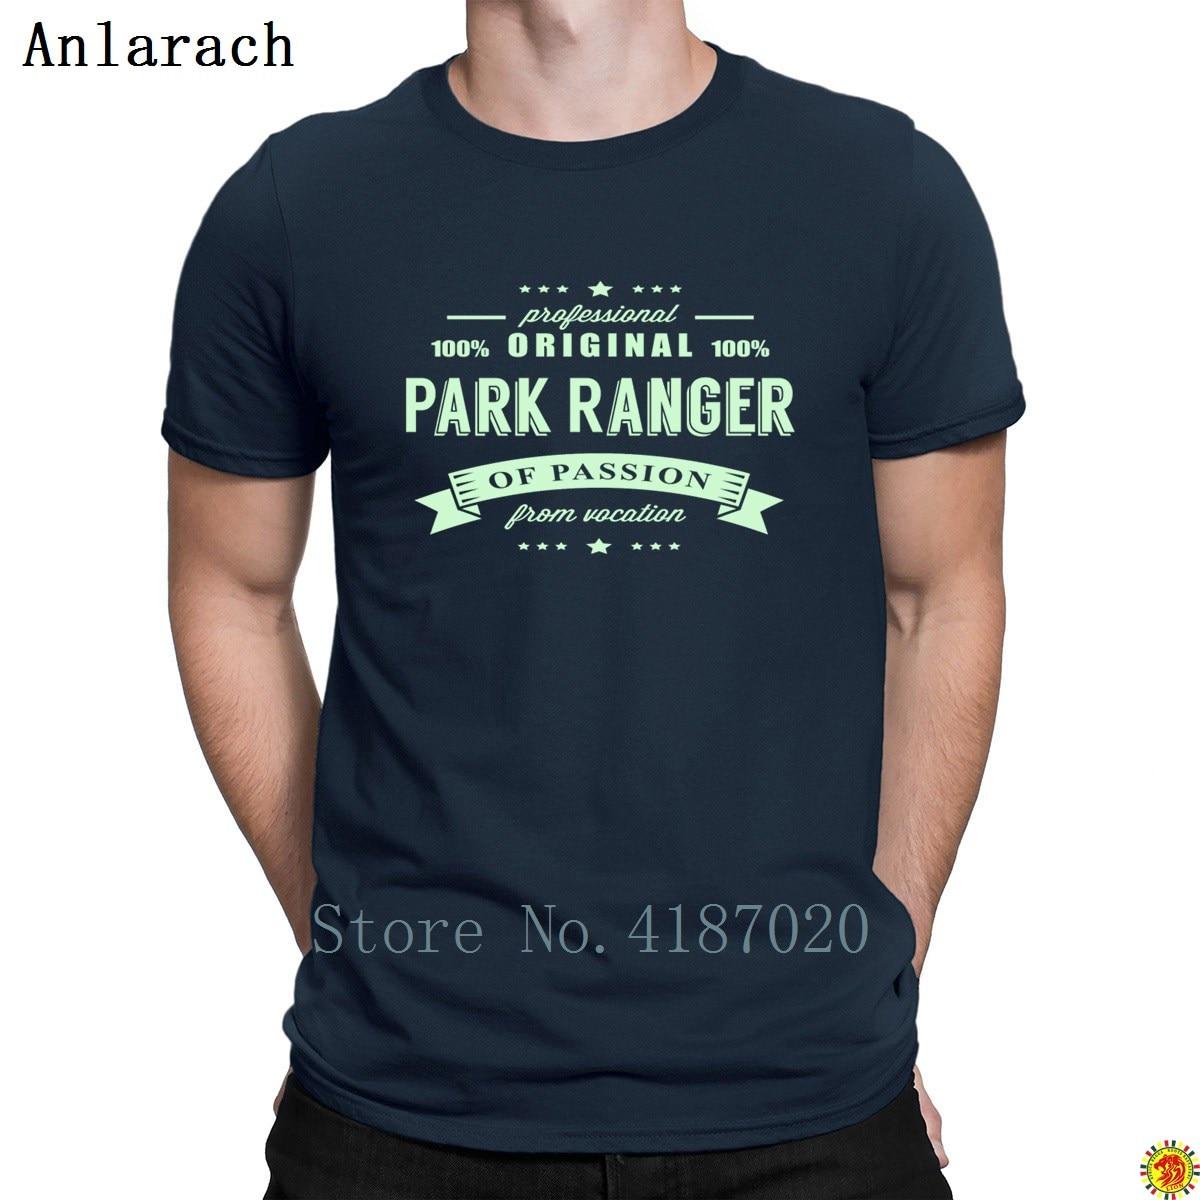 Park Ranger Passie T Shirt Grote Persoonlijkheid Hiphop Leisure Mannen T-shirt Lente Herfst Korte Mouw Anlarach Interessante